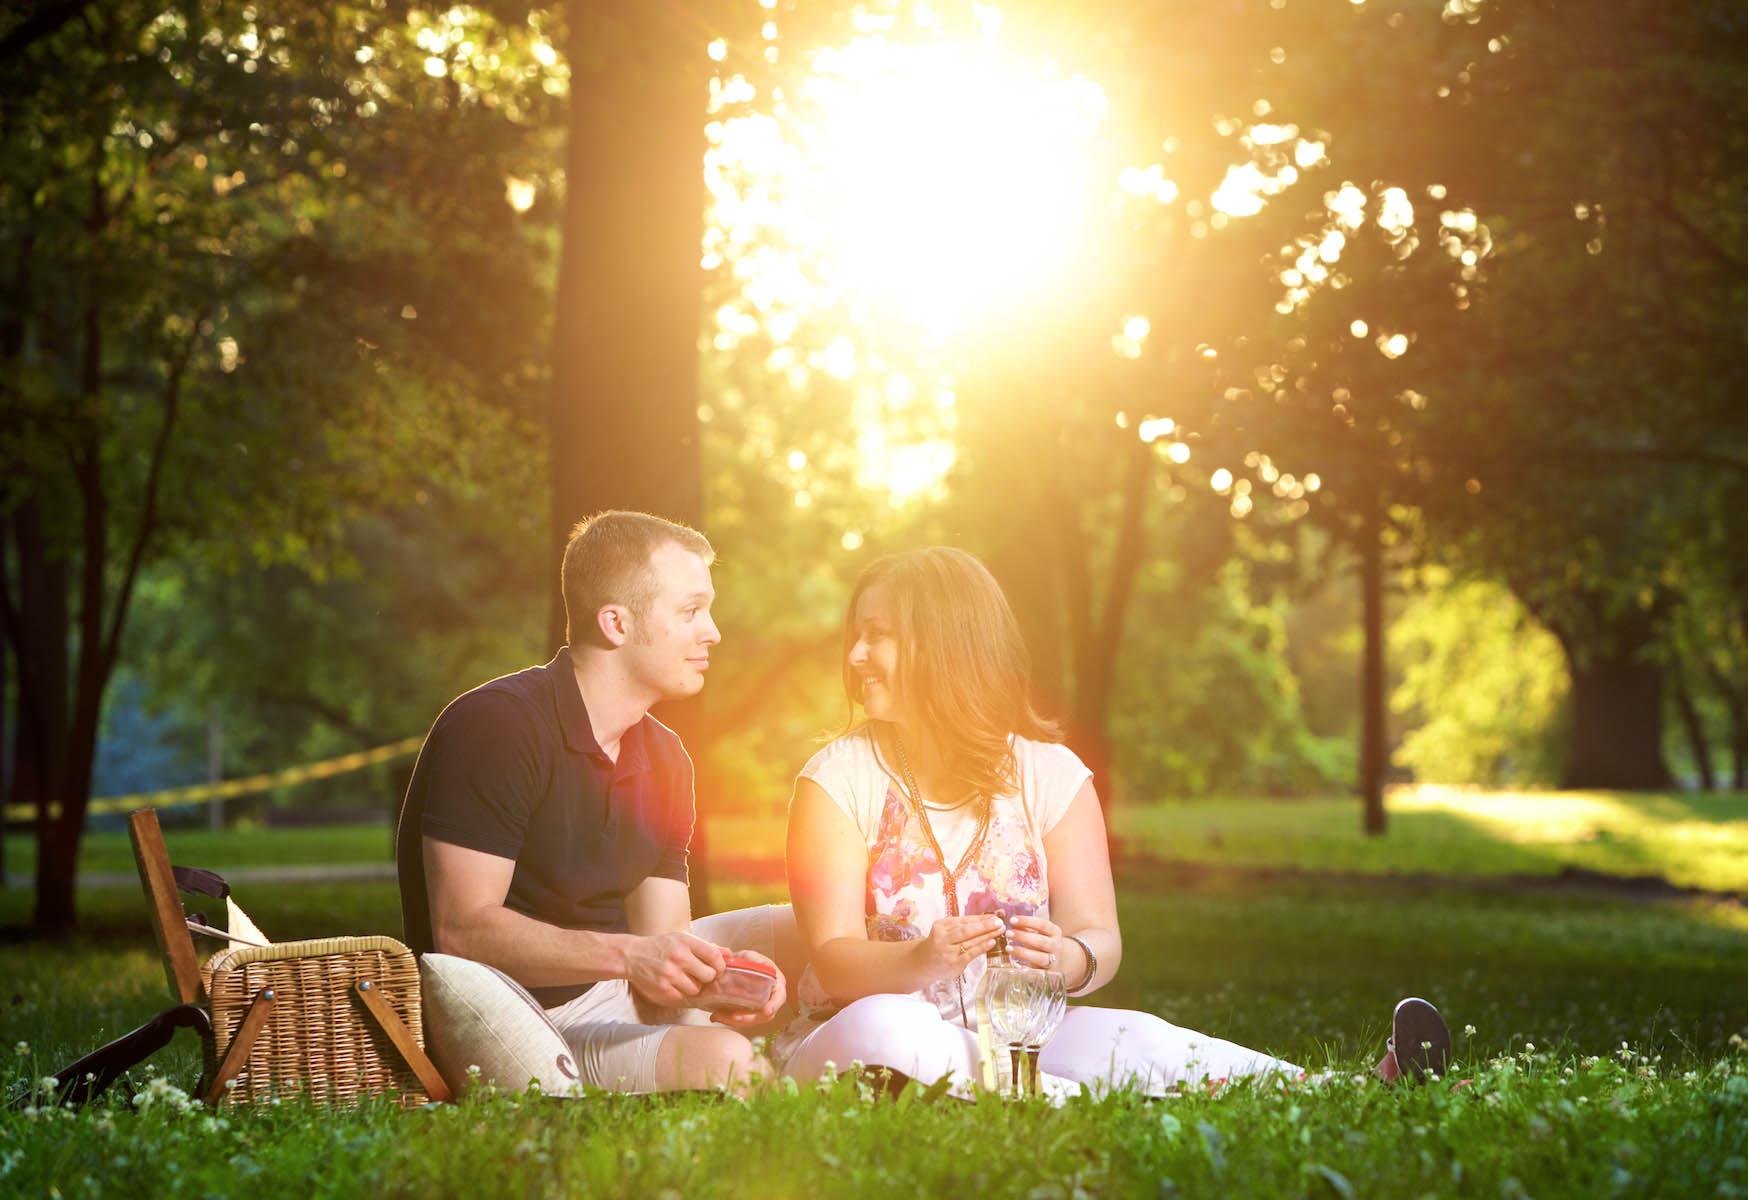 Lafayette Park (Lafayette Square) — St. Louis engagement session for Alissa & Ben. Wedding photography by Tiffany & Steve Warmowski.